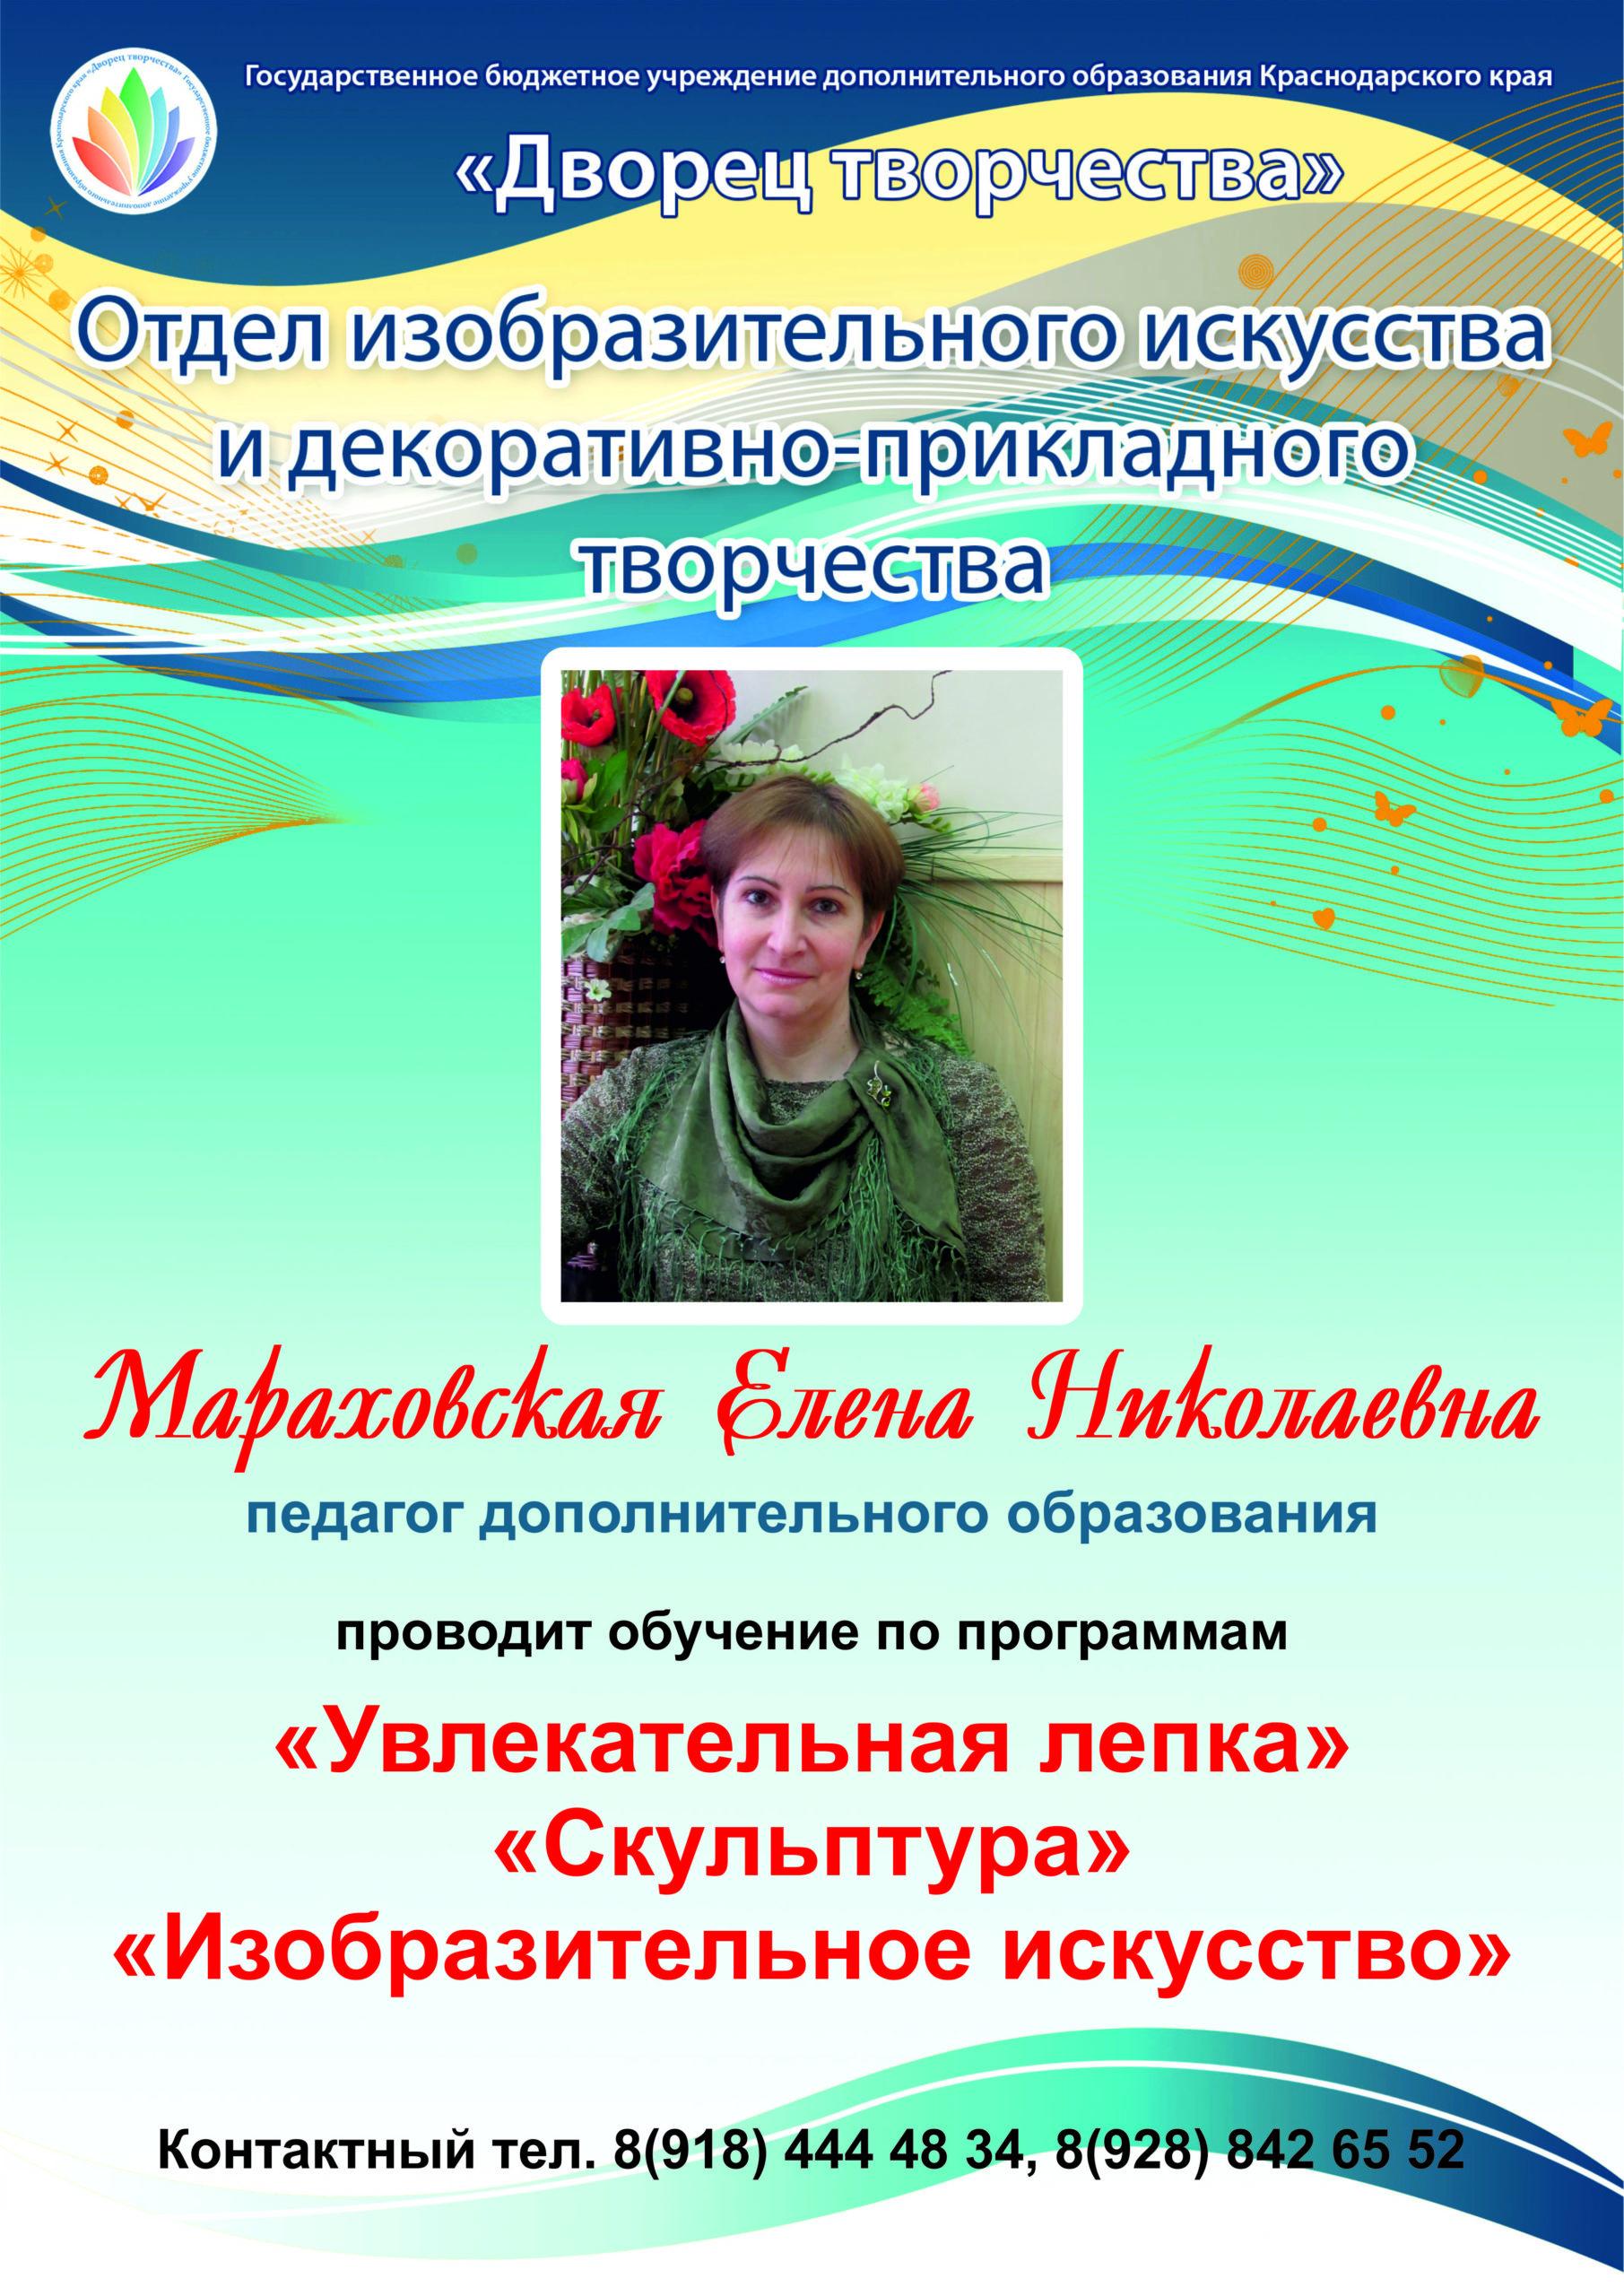 Афиша-реклама педагоги Мараховская